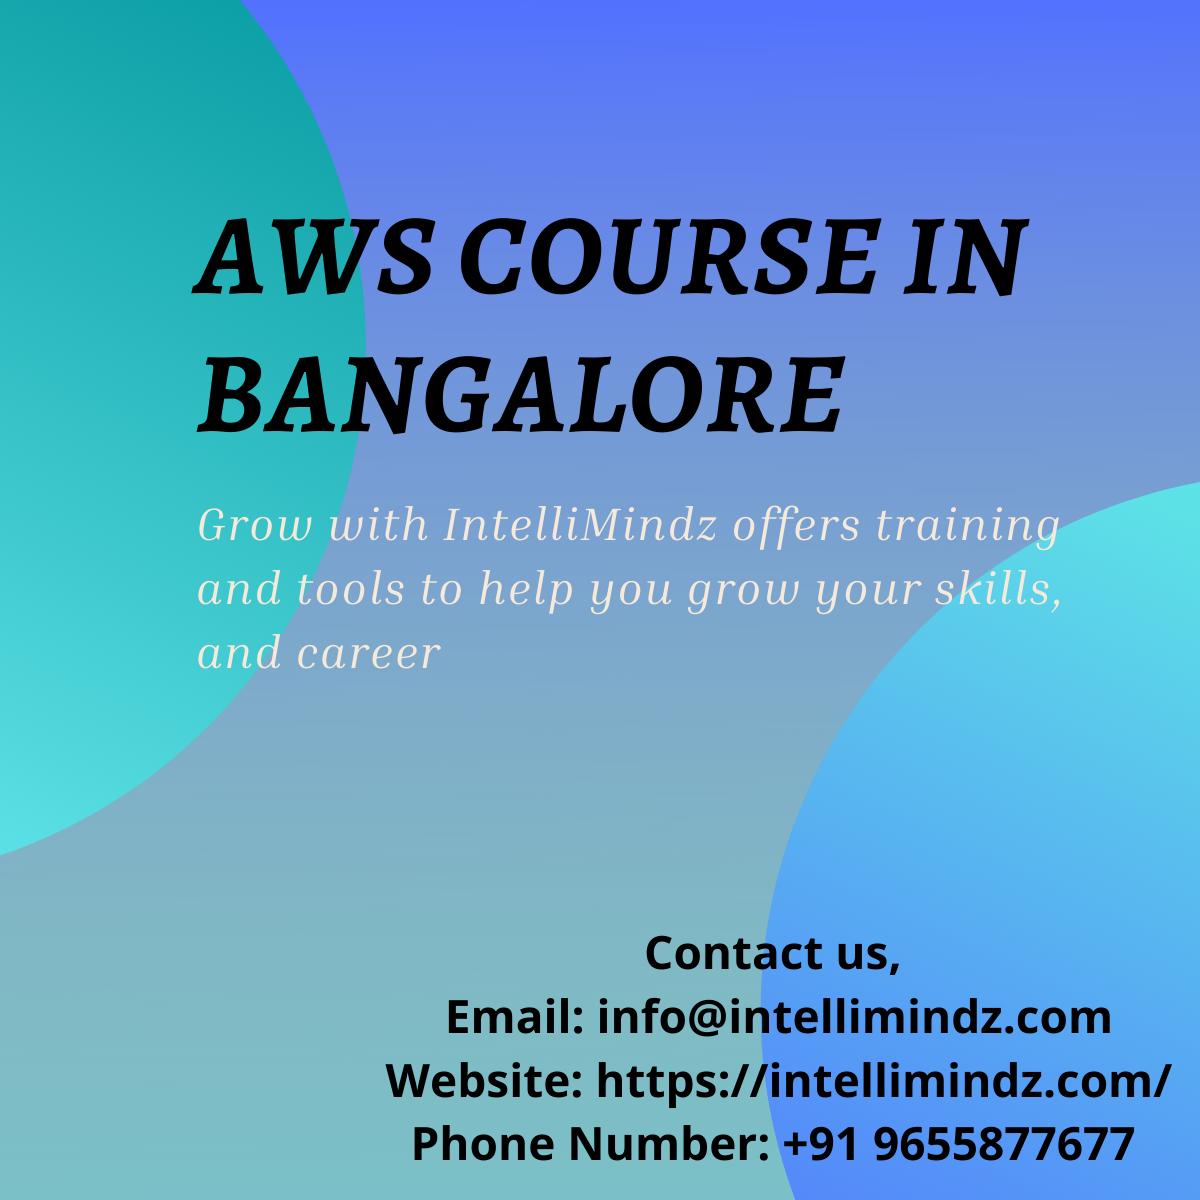 AWS Course in Bangalore